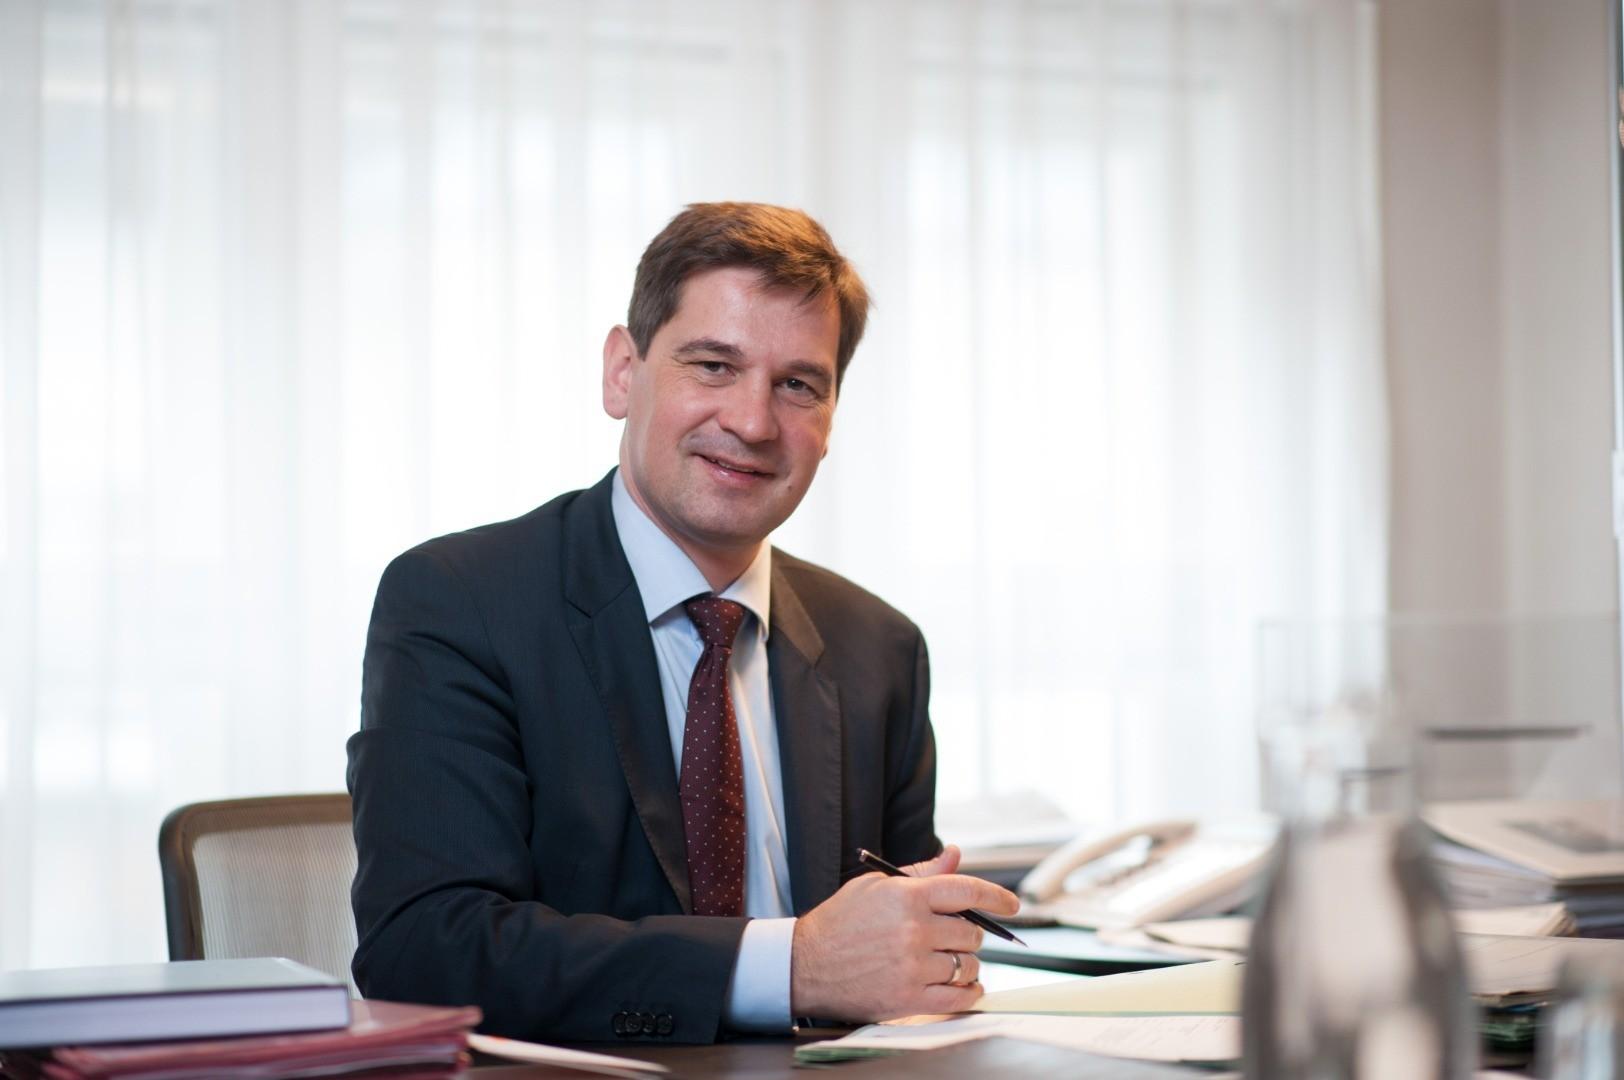 FO-200330-kr-UnserYbbstal-Vorwort-BGM-Krammer-2015-(c) Josef Herfert.JPG